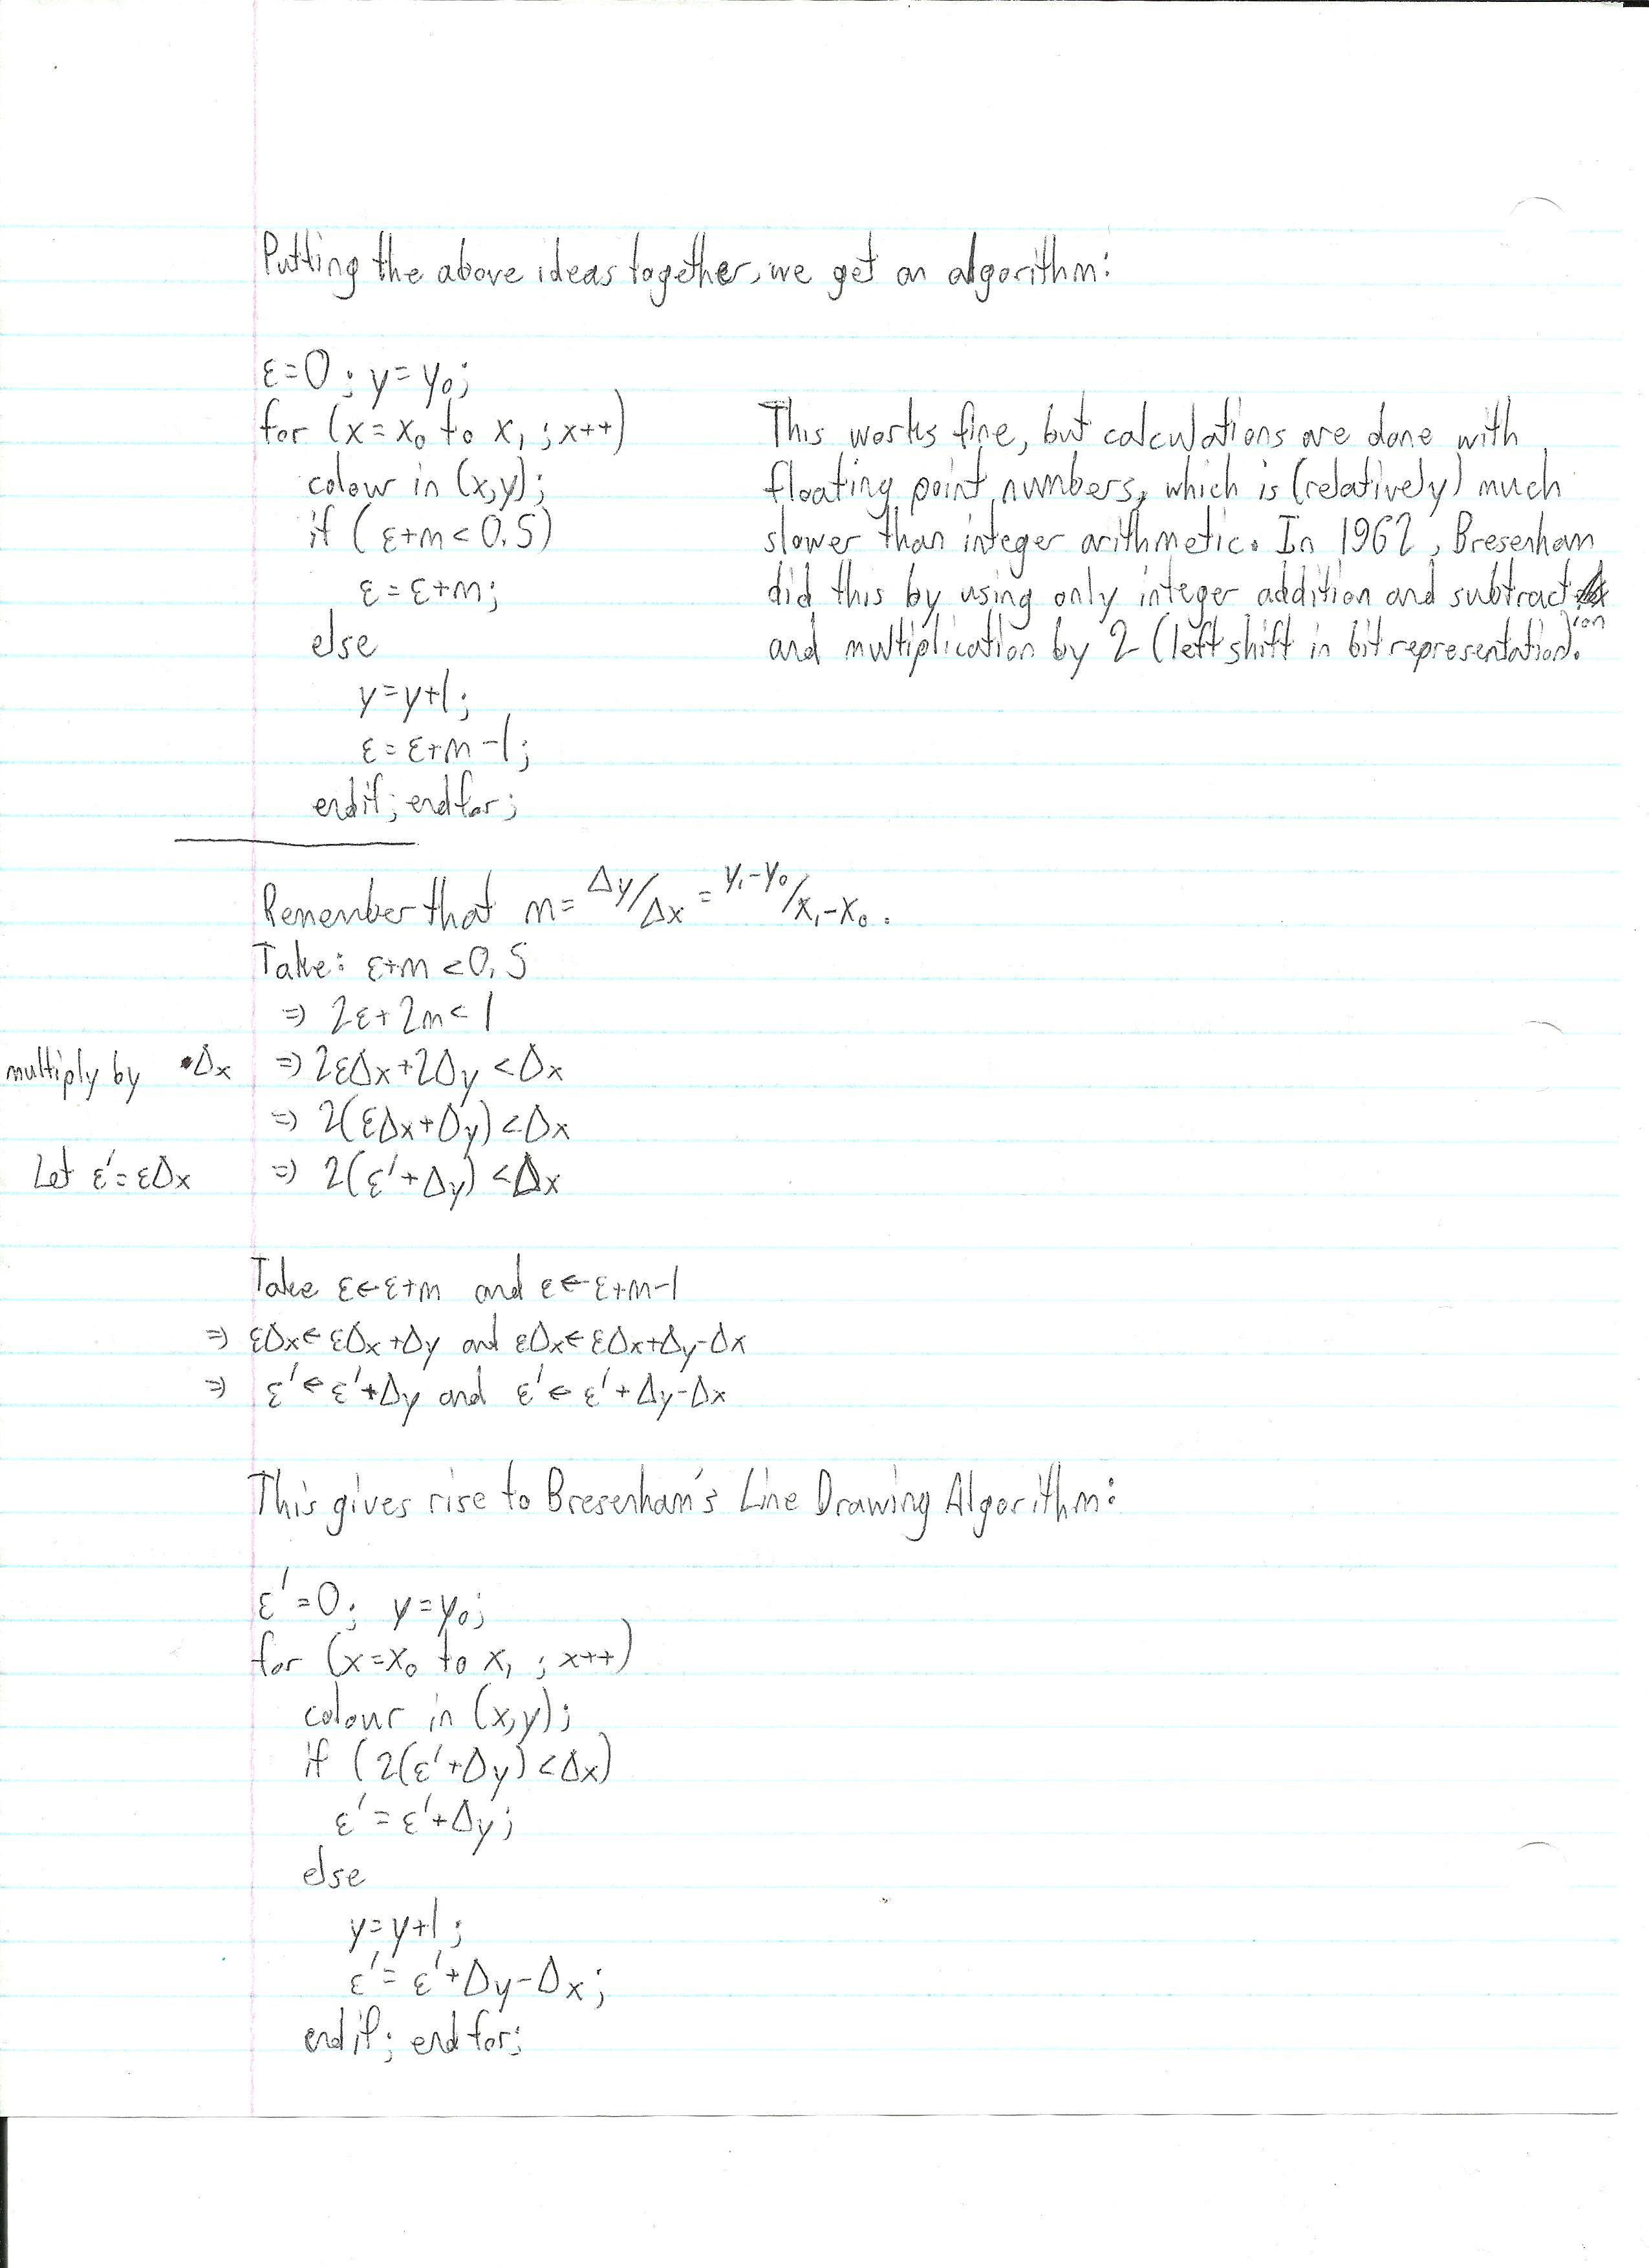 Bresenham Line Drawing Algorithm Time Complexity : Liviu mihai calin